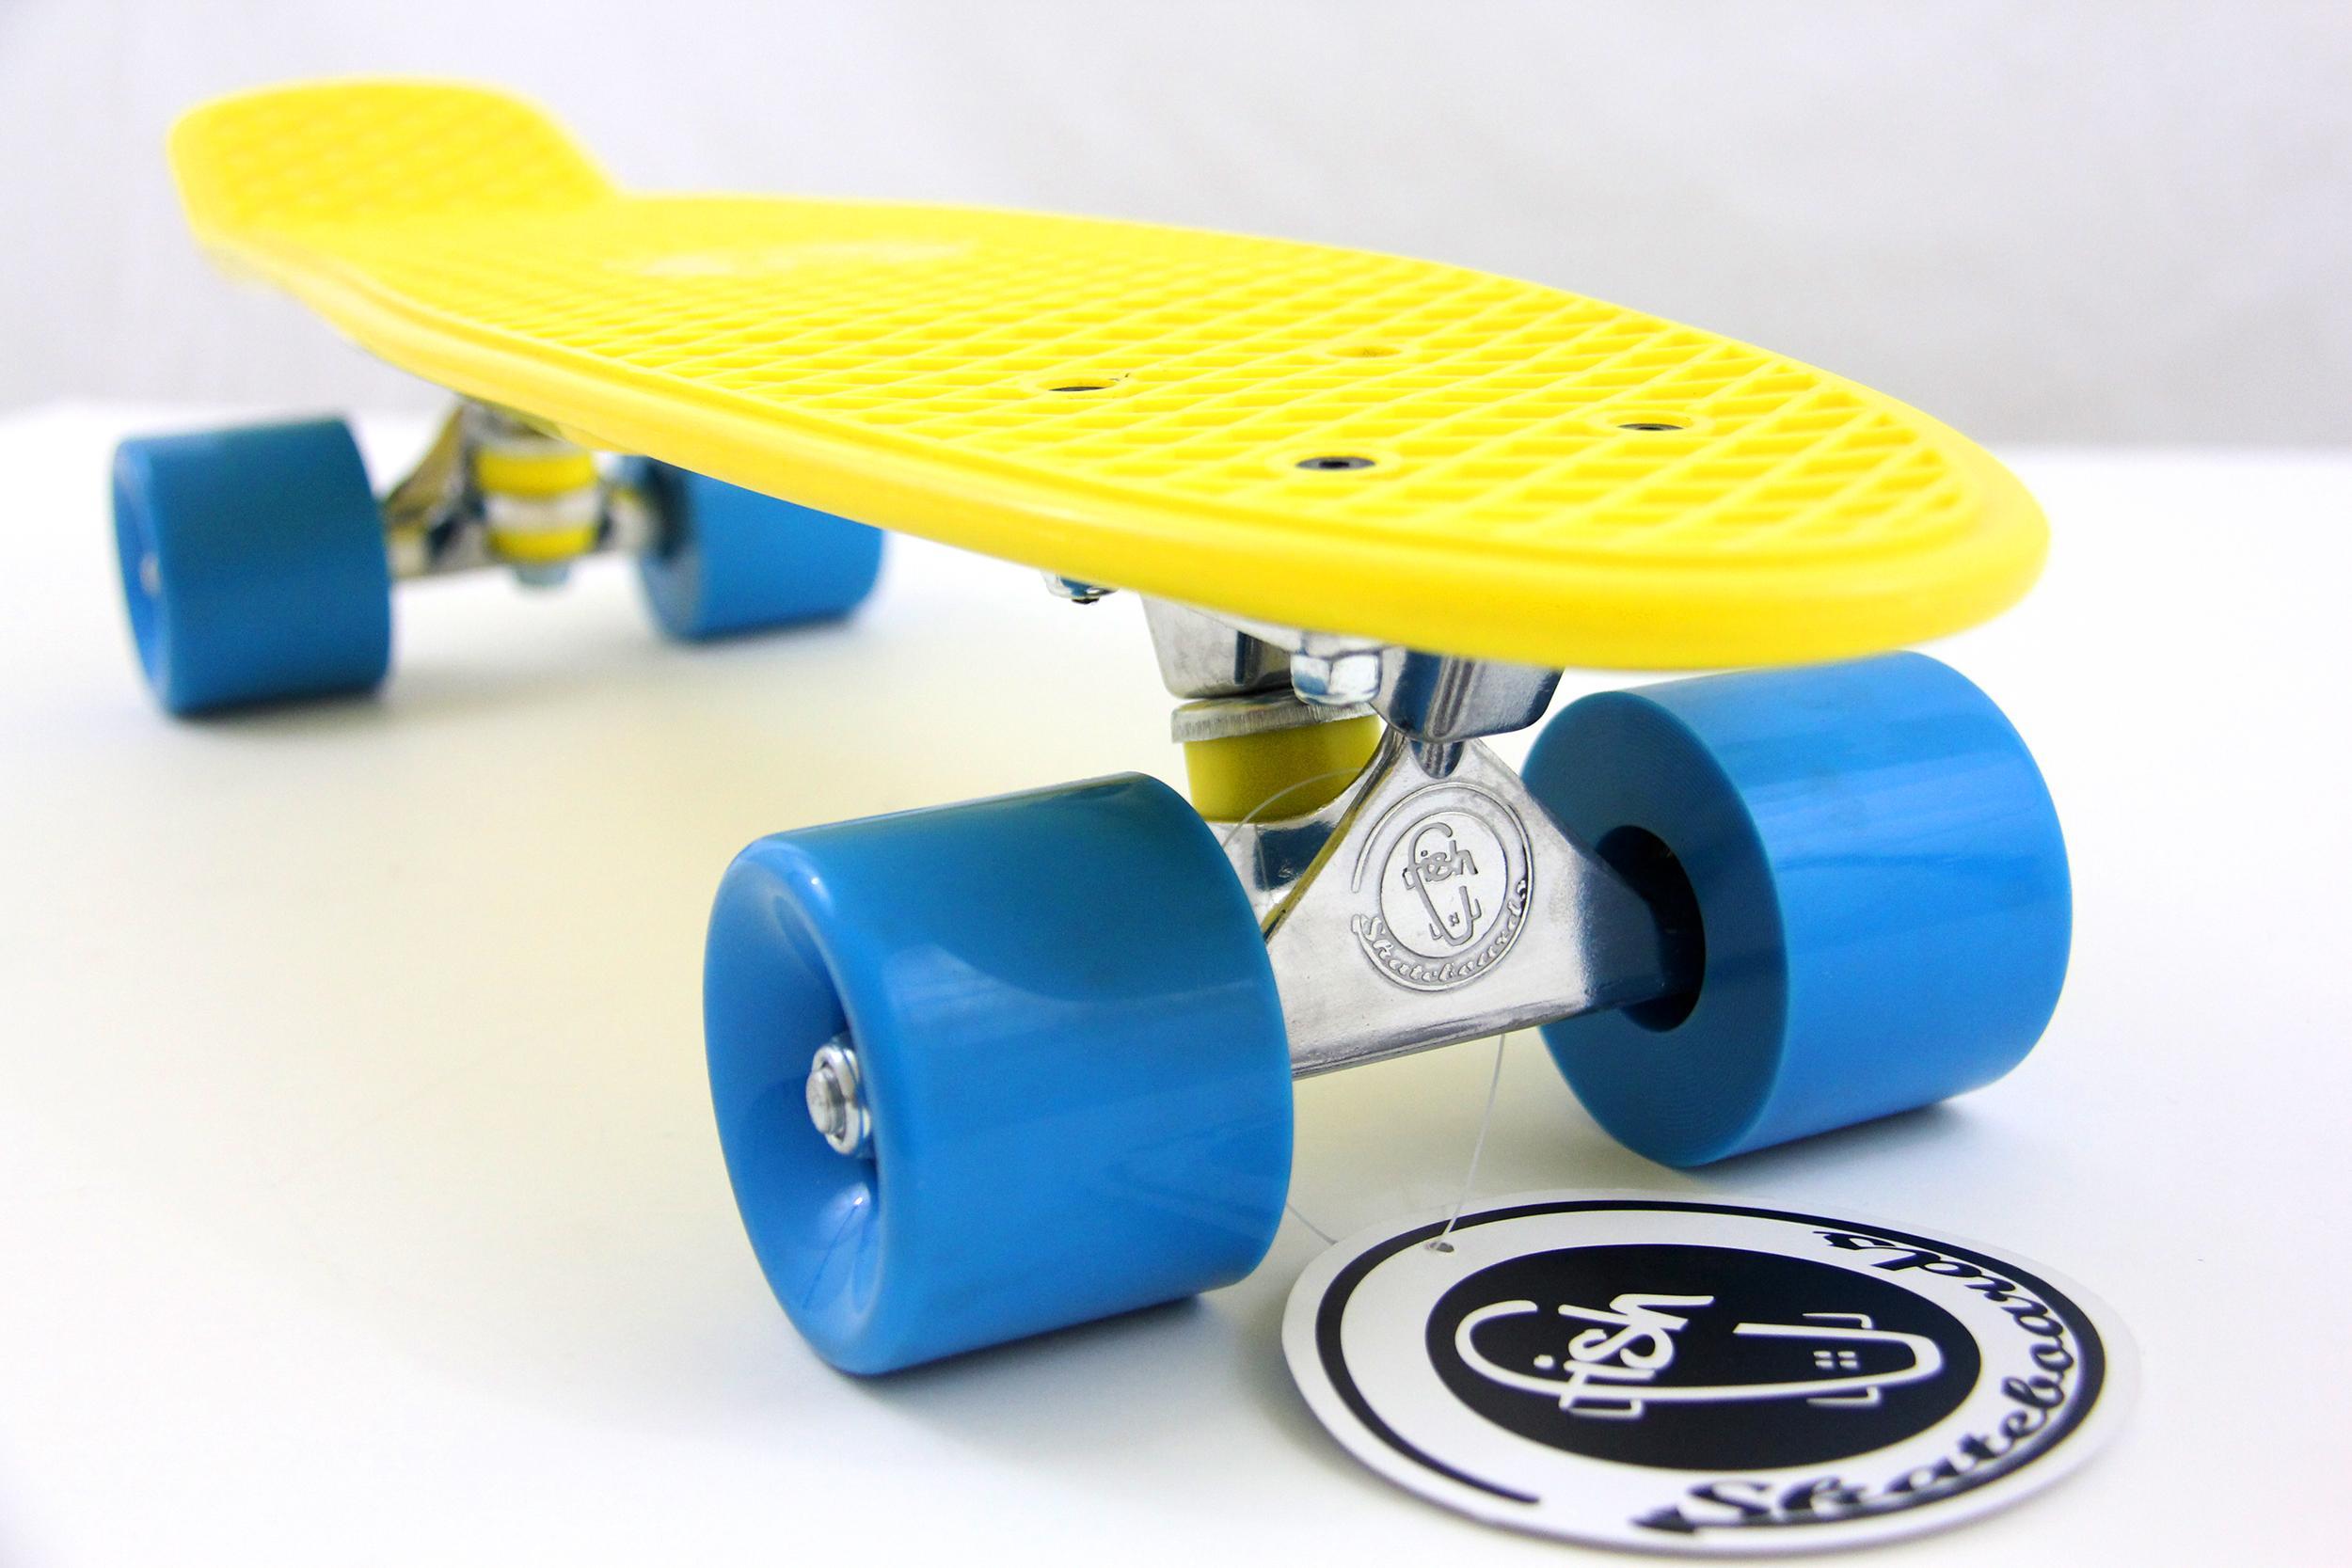 fish skateboard yellow 22 retro cruiser blue wheel silver. Black Bedroom Furniture Sets. Home Design Ideas